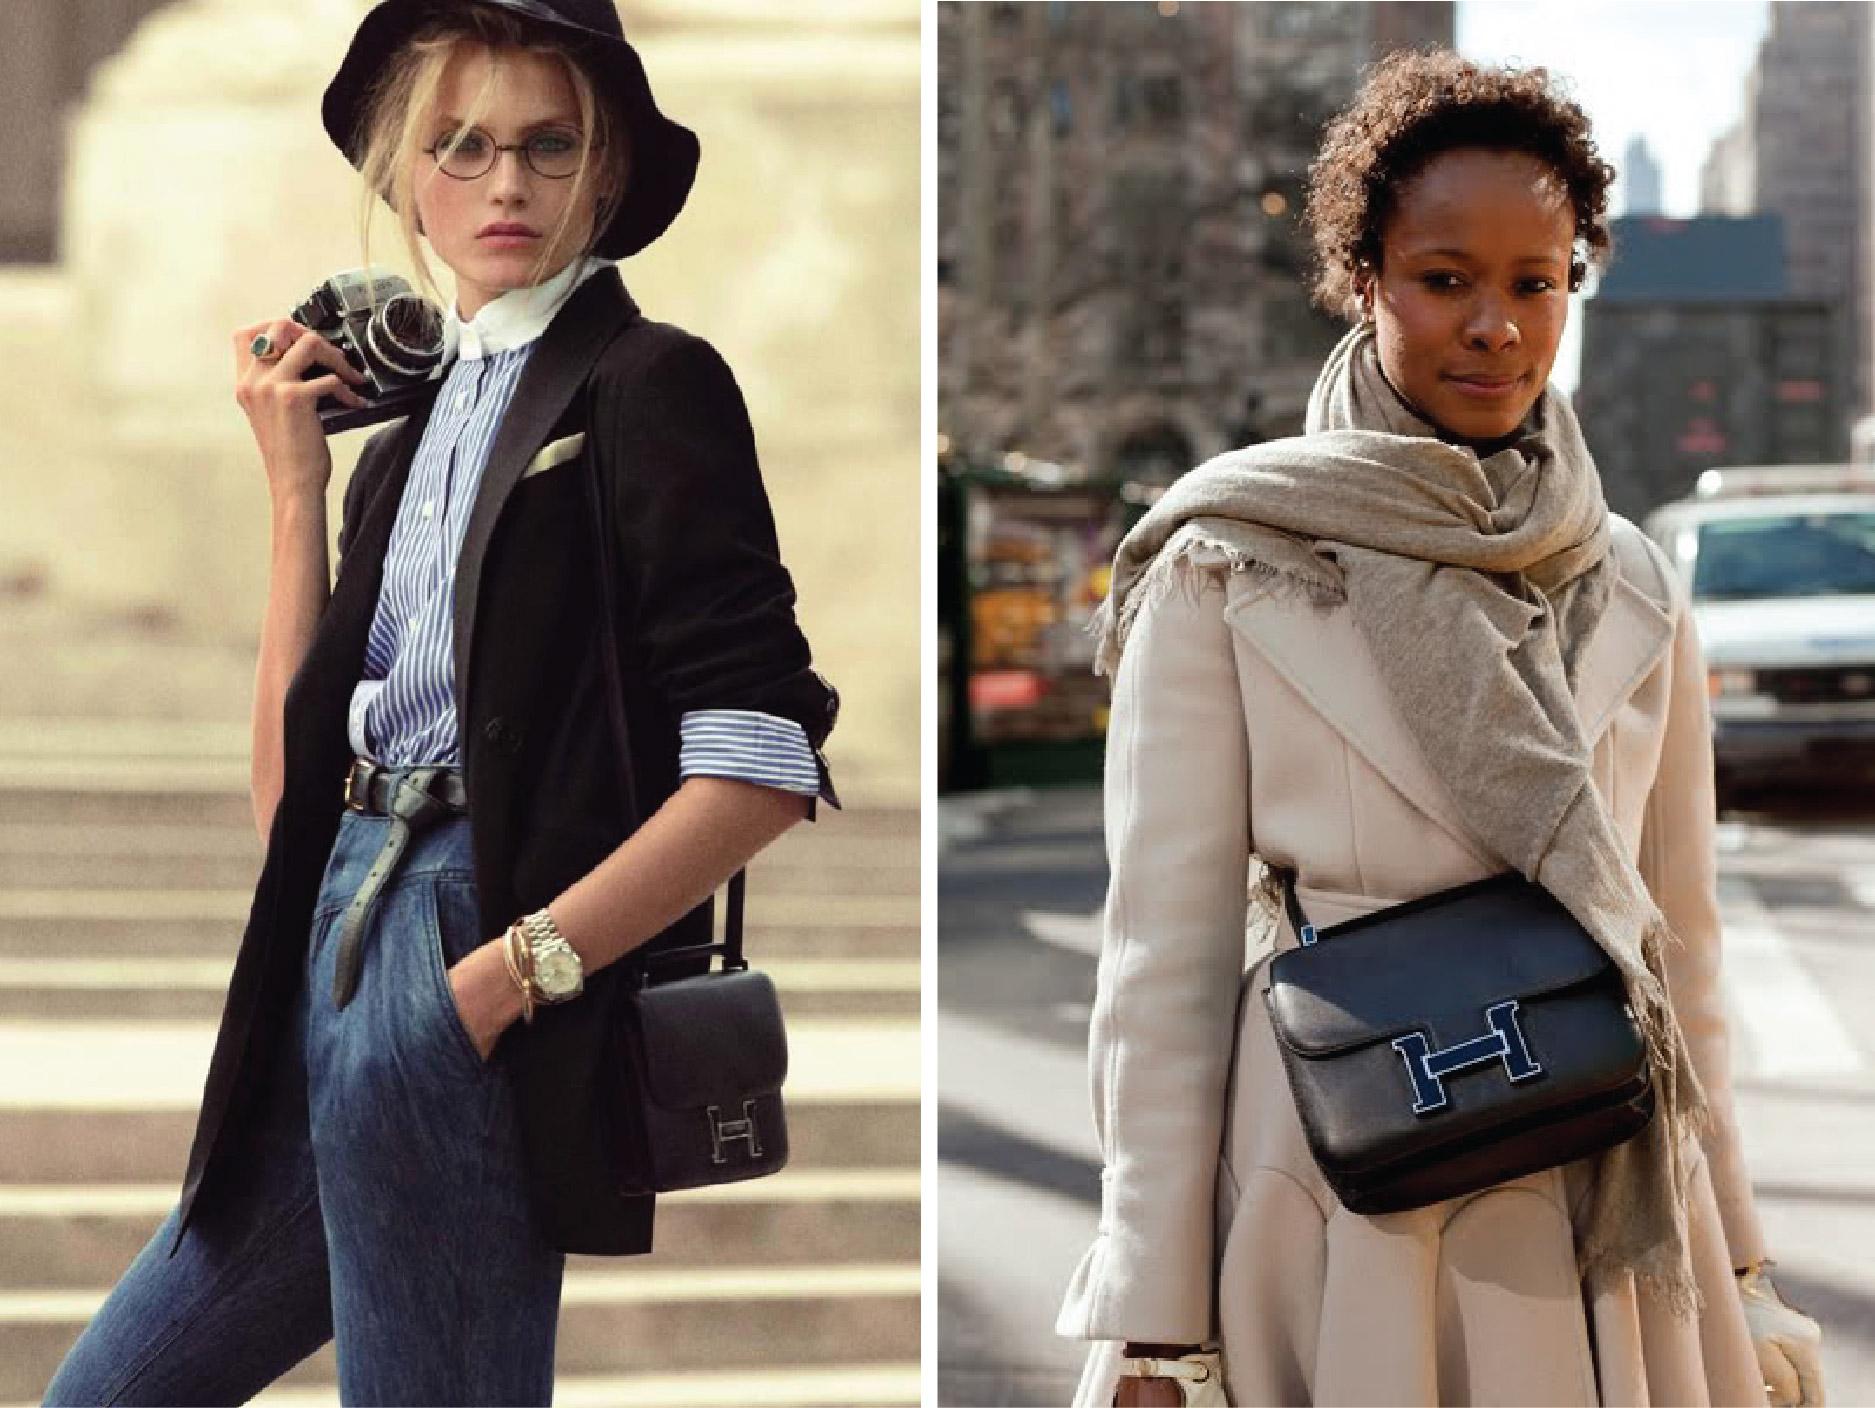 Hermes Birkin, Anastasia Barbieri, Shala Monroque, Classic Black Crossbody, The Best Designer Handbags